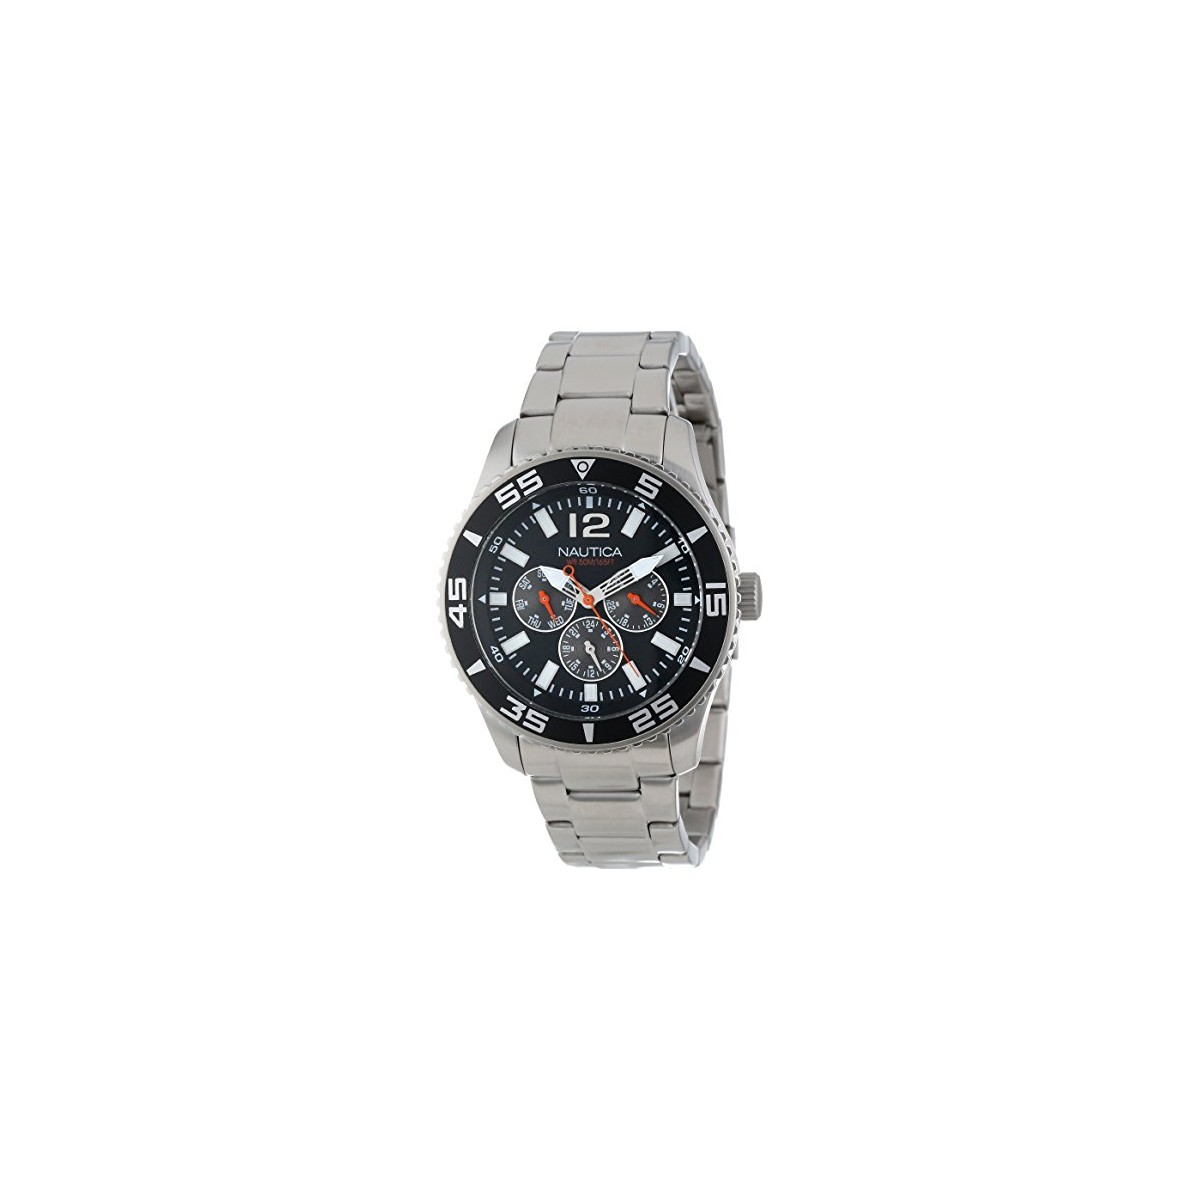 https://www.gaberjoyeria.com/3310-thickbox_default/reloj-nautica-n13652g.jpg